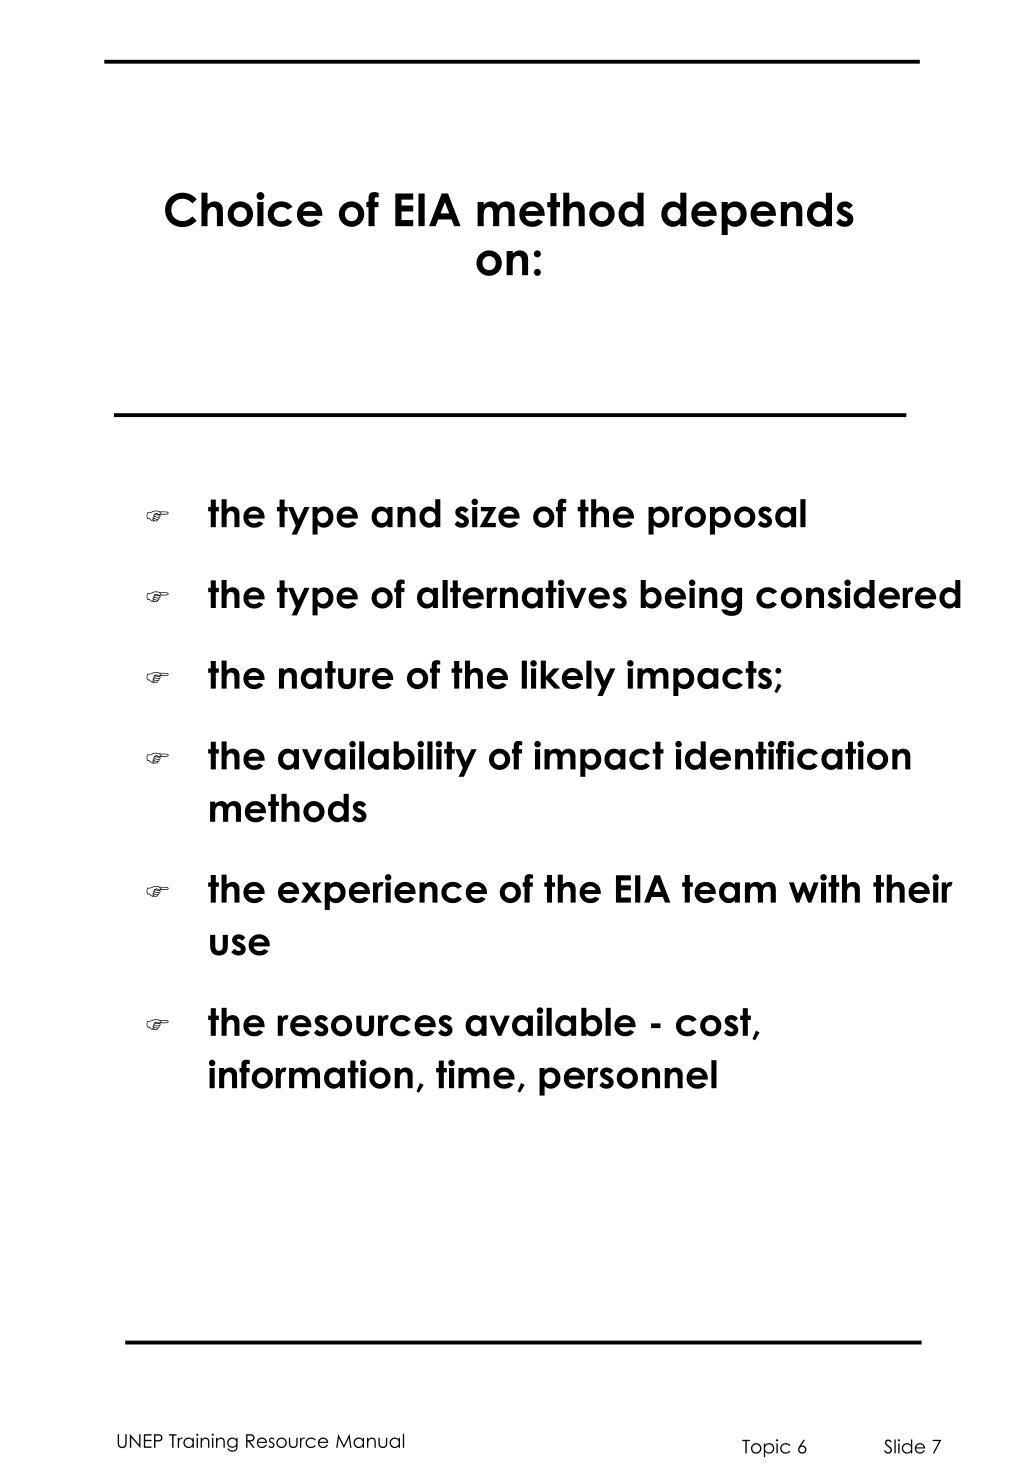 Choice of EIA method depends on: